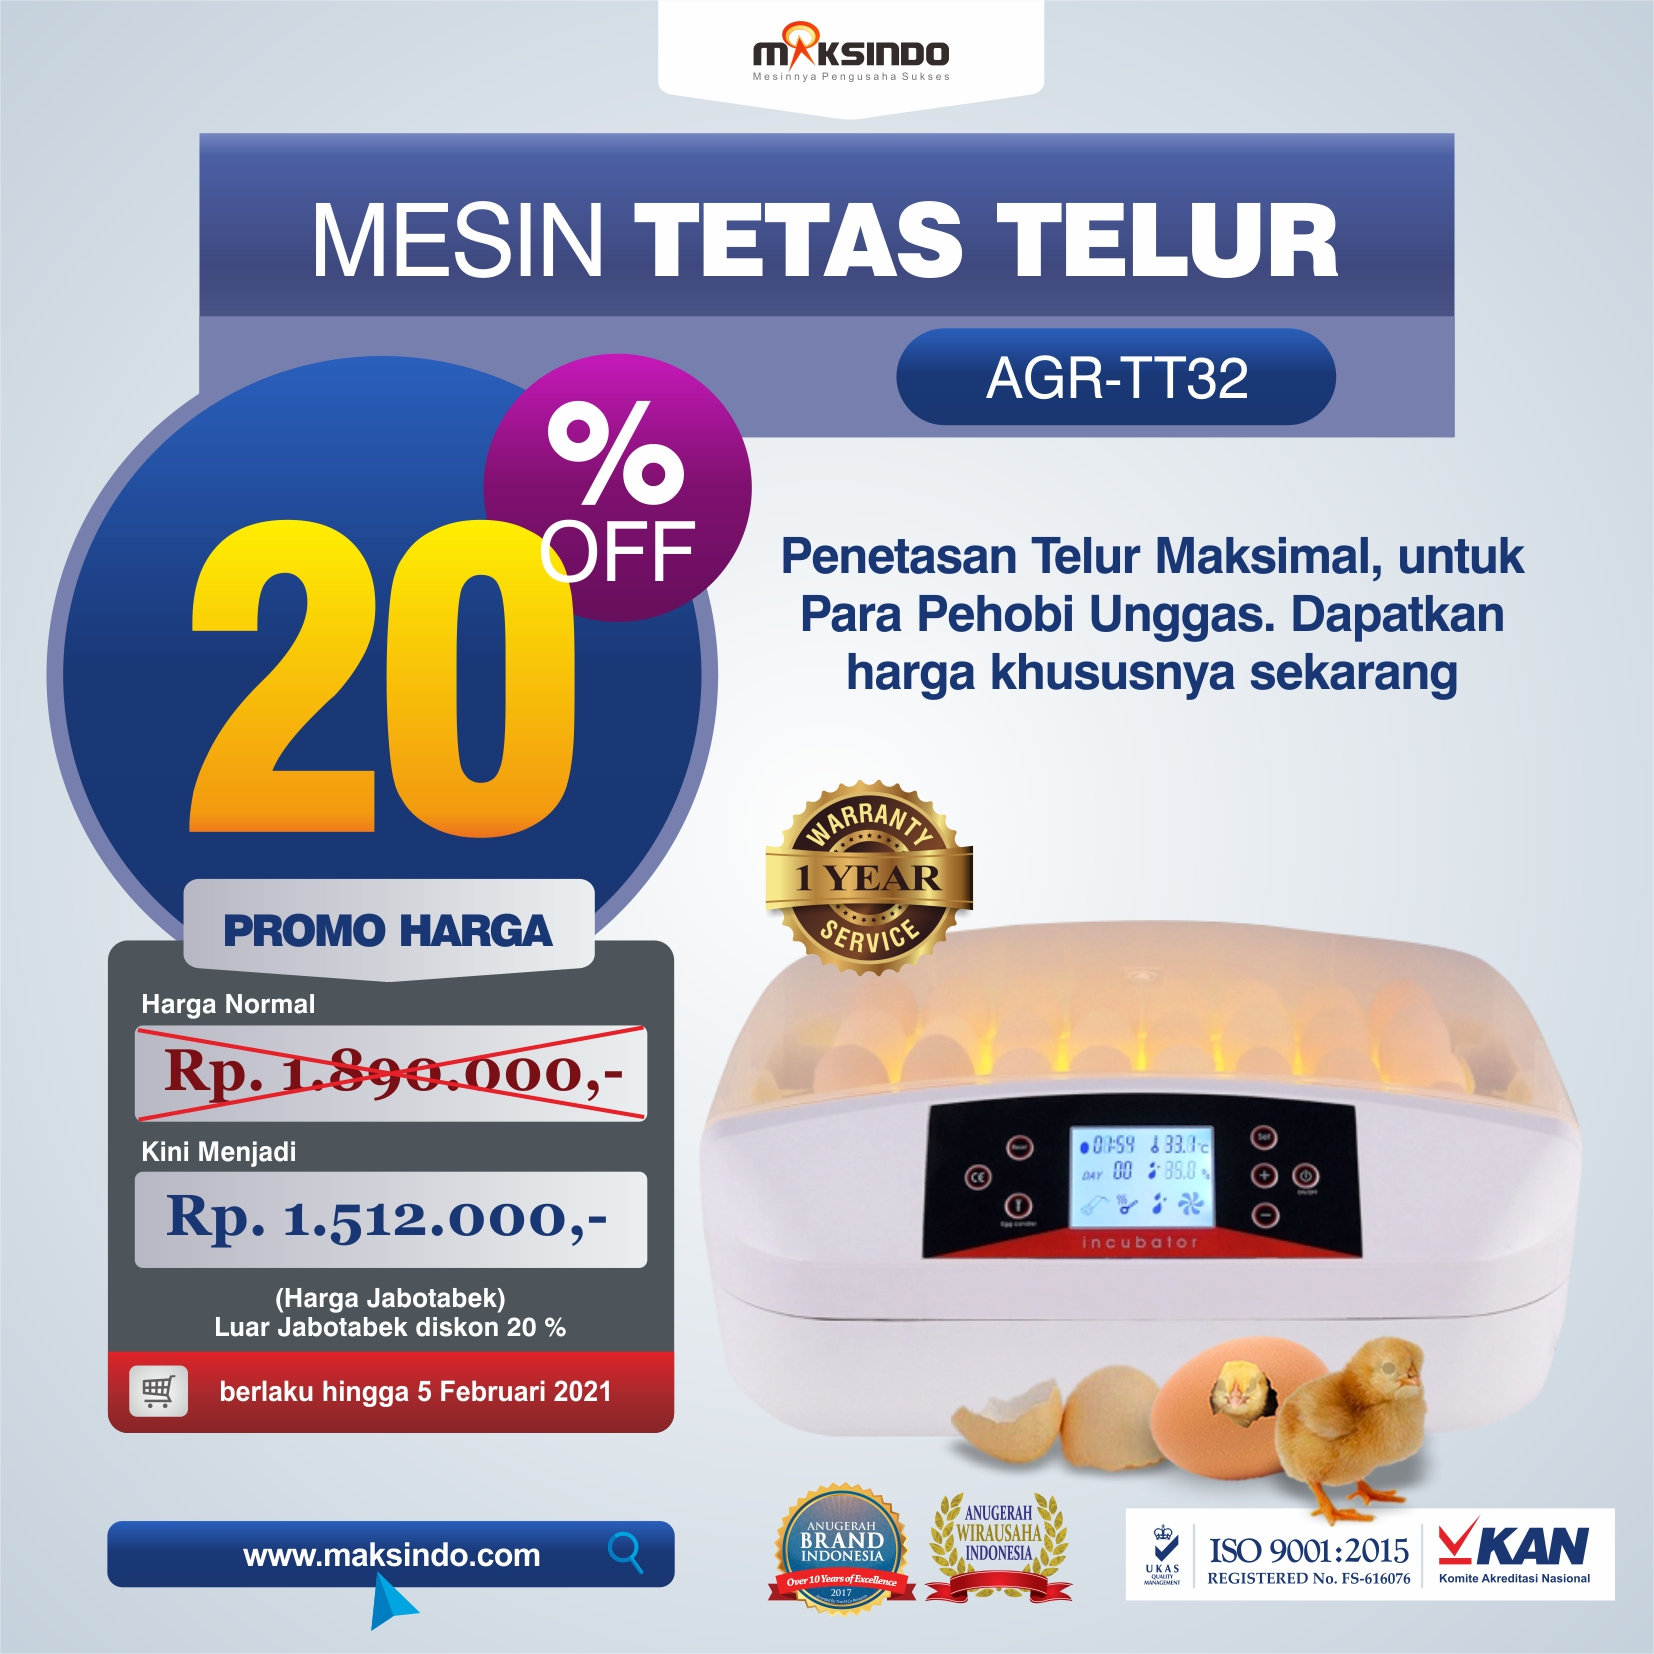 Jual Mesin Penetas Telur 32 Butir (AGR-TT32) di Medan